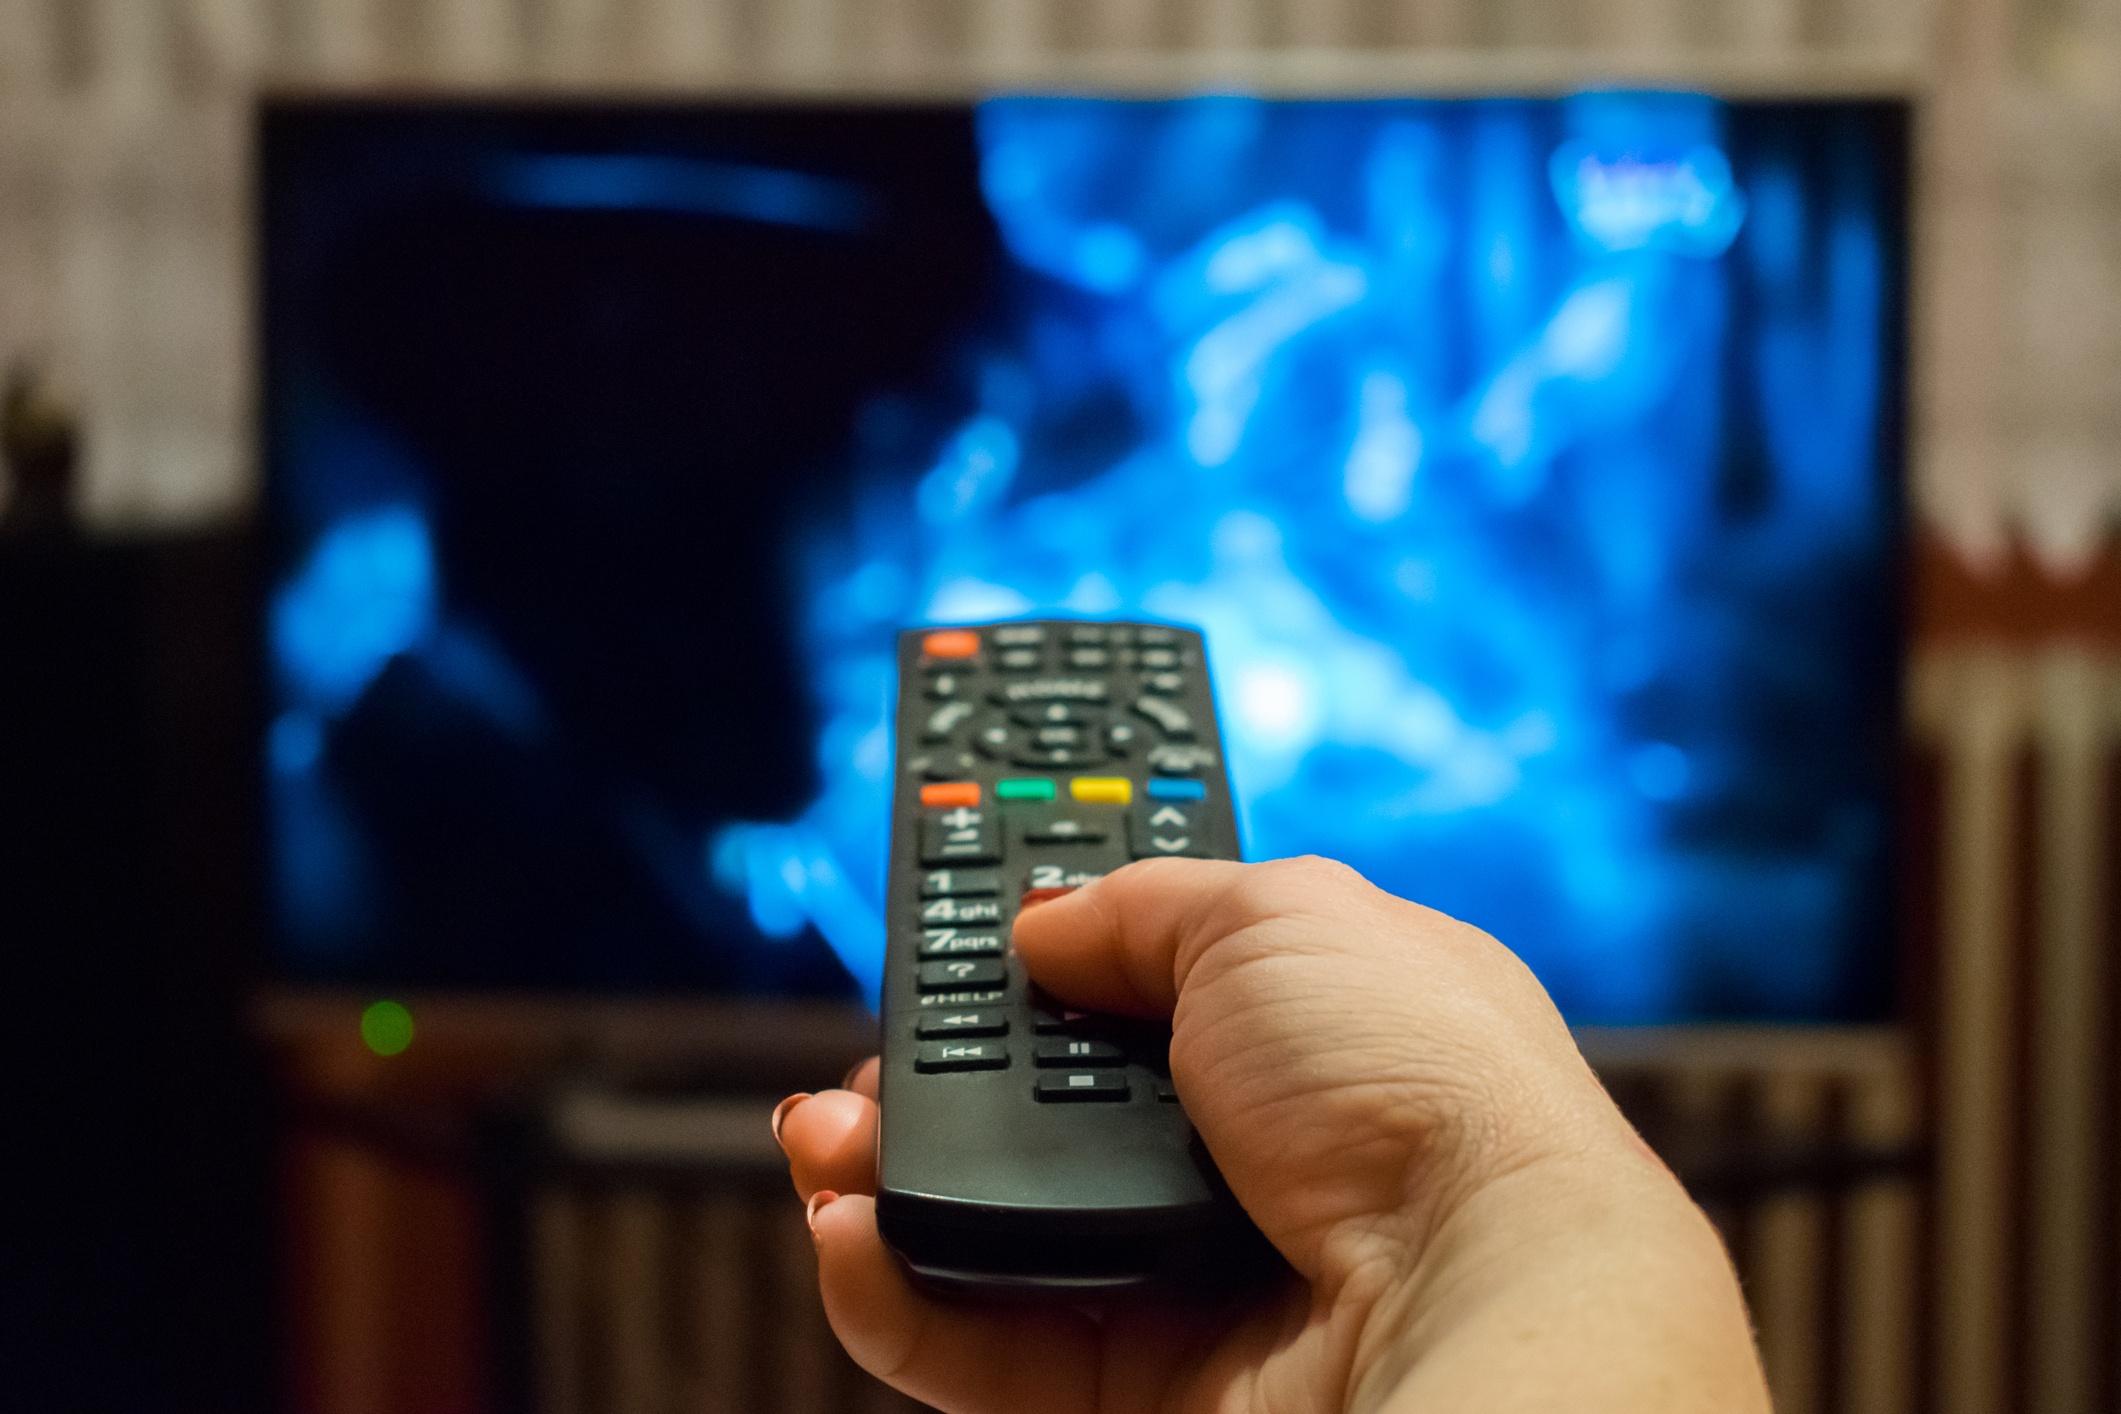 TV Remote. JConnelly Blog Brand Integrations Bridge the Gap Between Advertising and PR.jpg